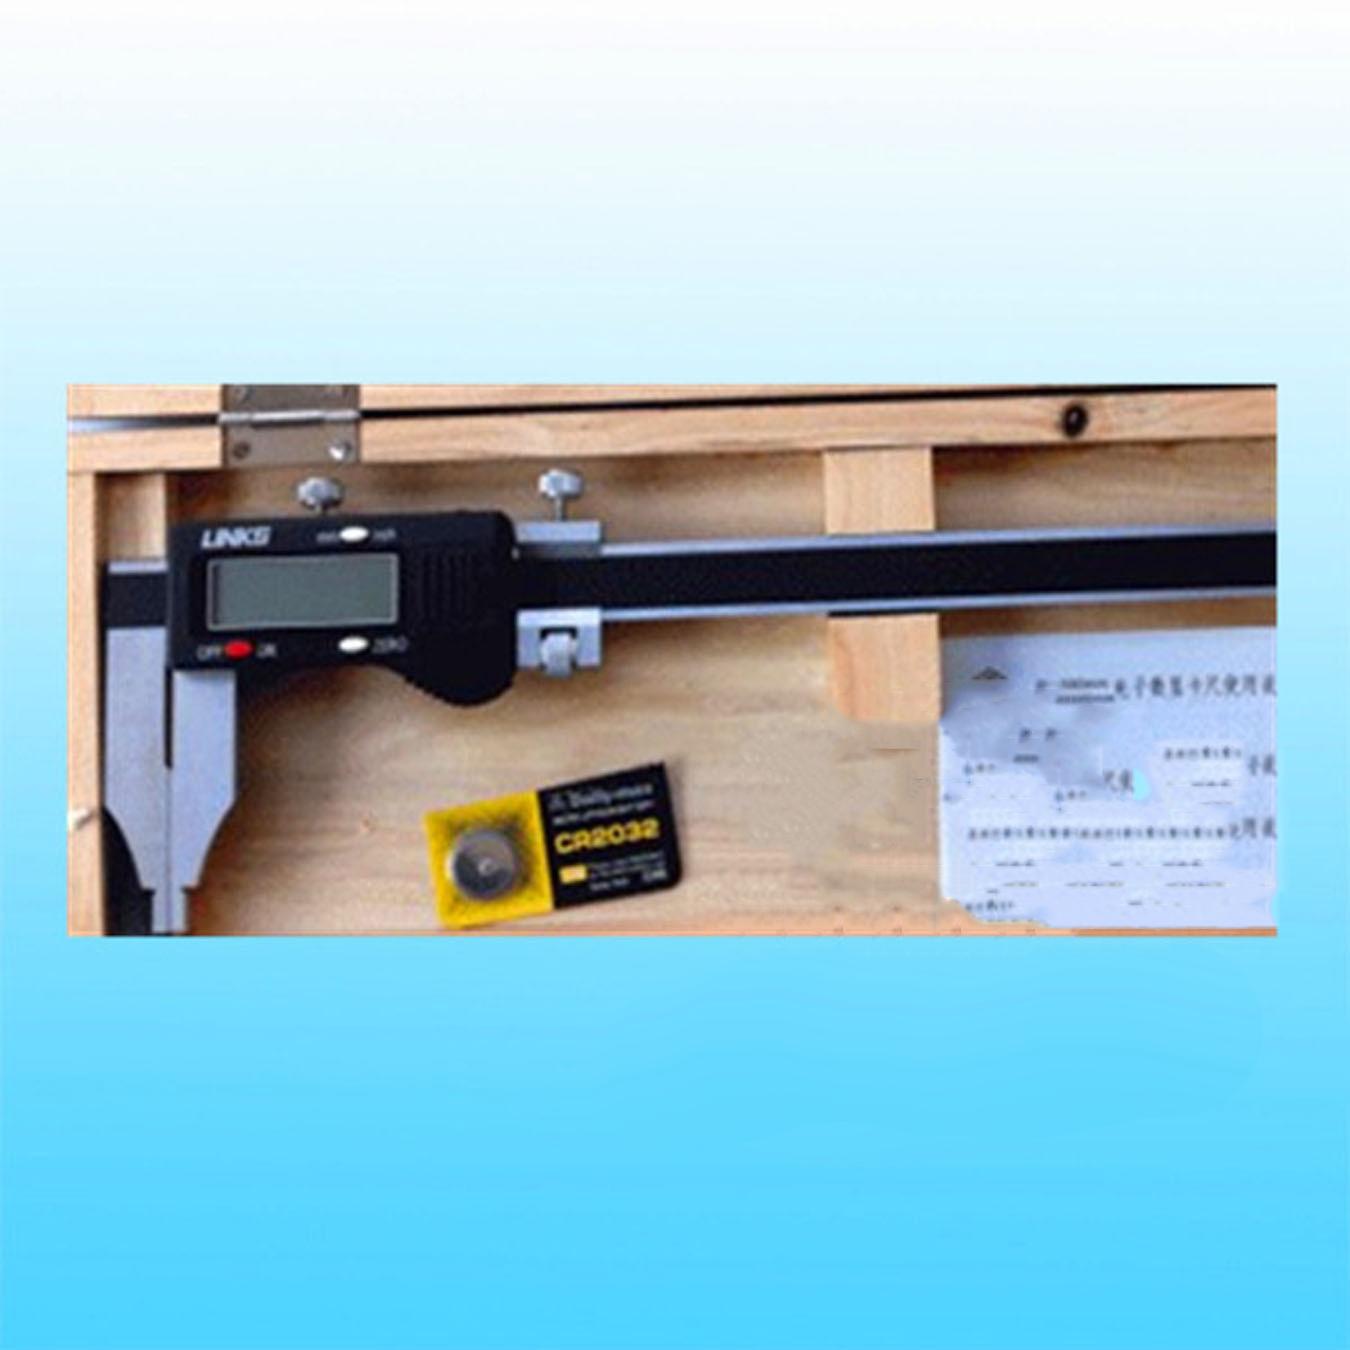 [] haliang quality products sale electronic digital caliper caliper